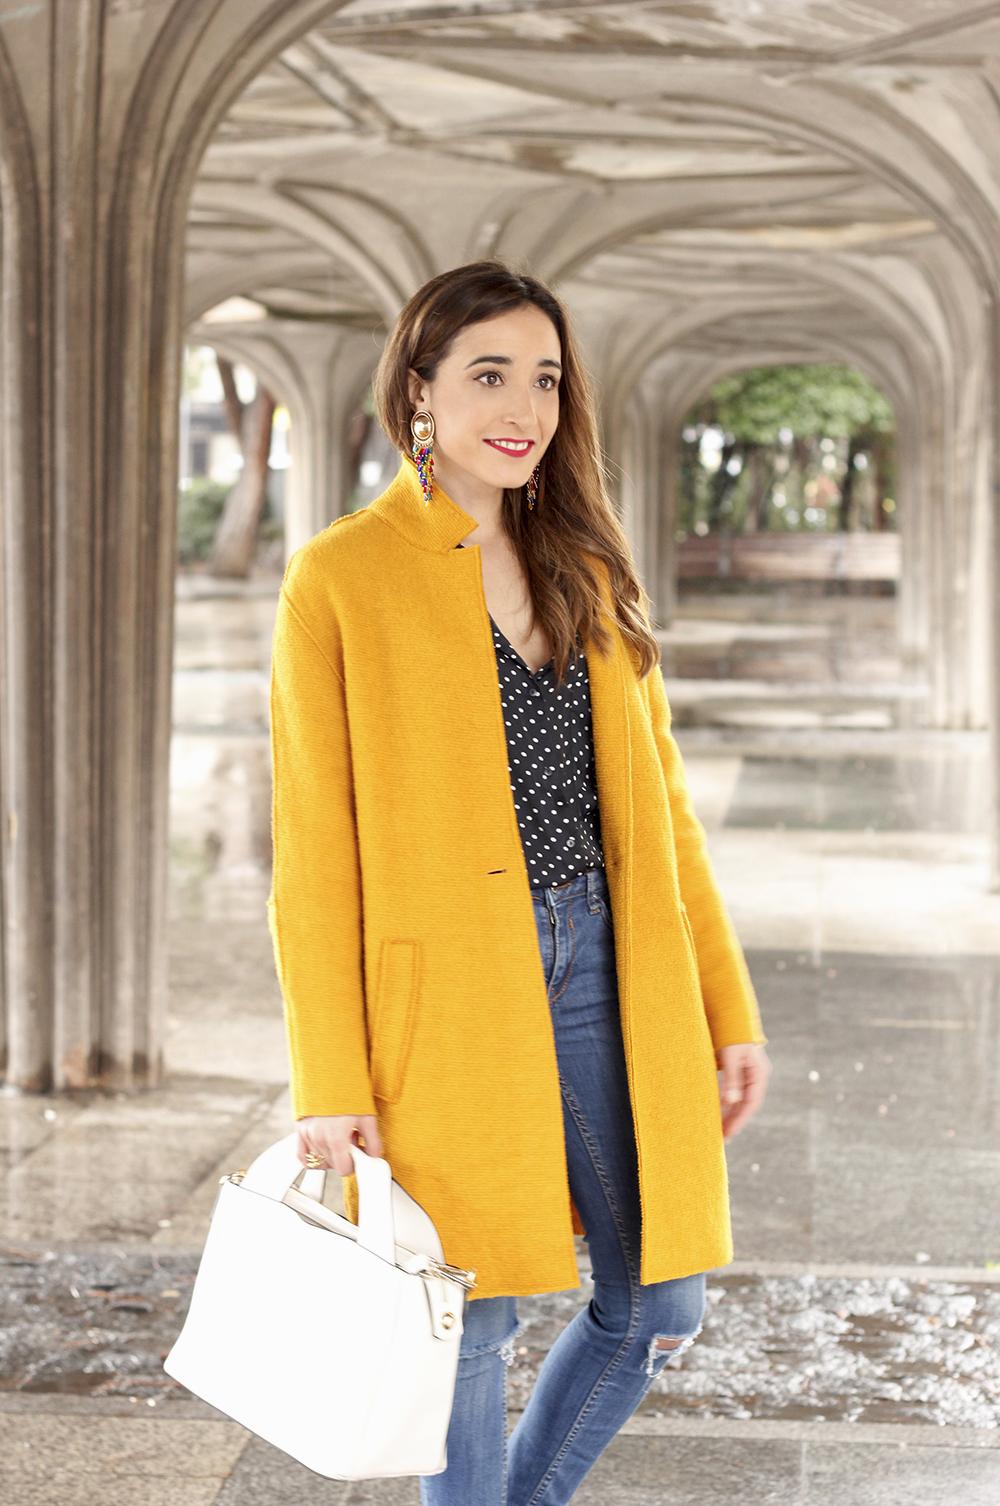 mustard coat polka dots shirt leopard heels white bag outfit 08